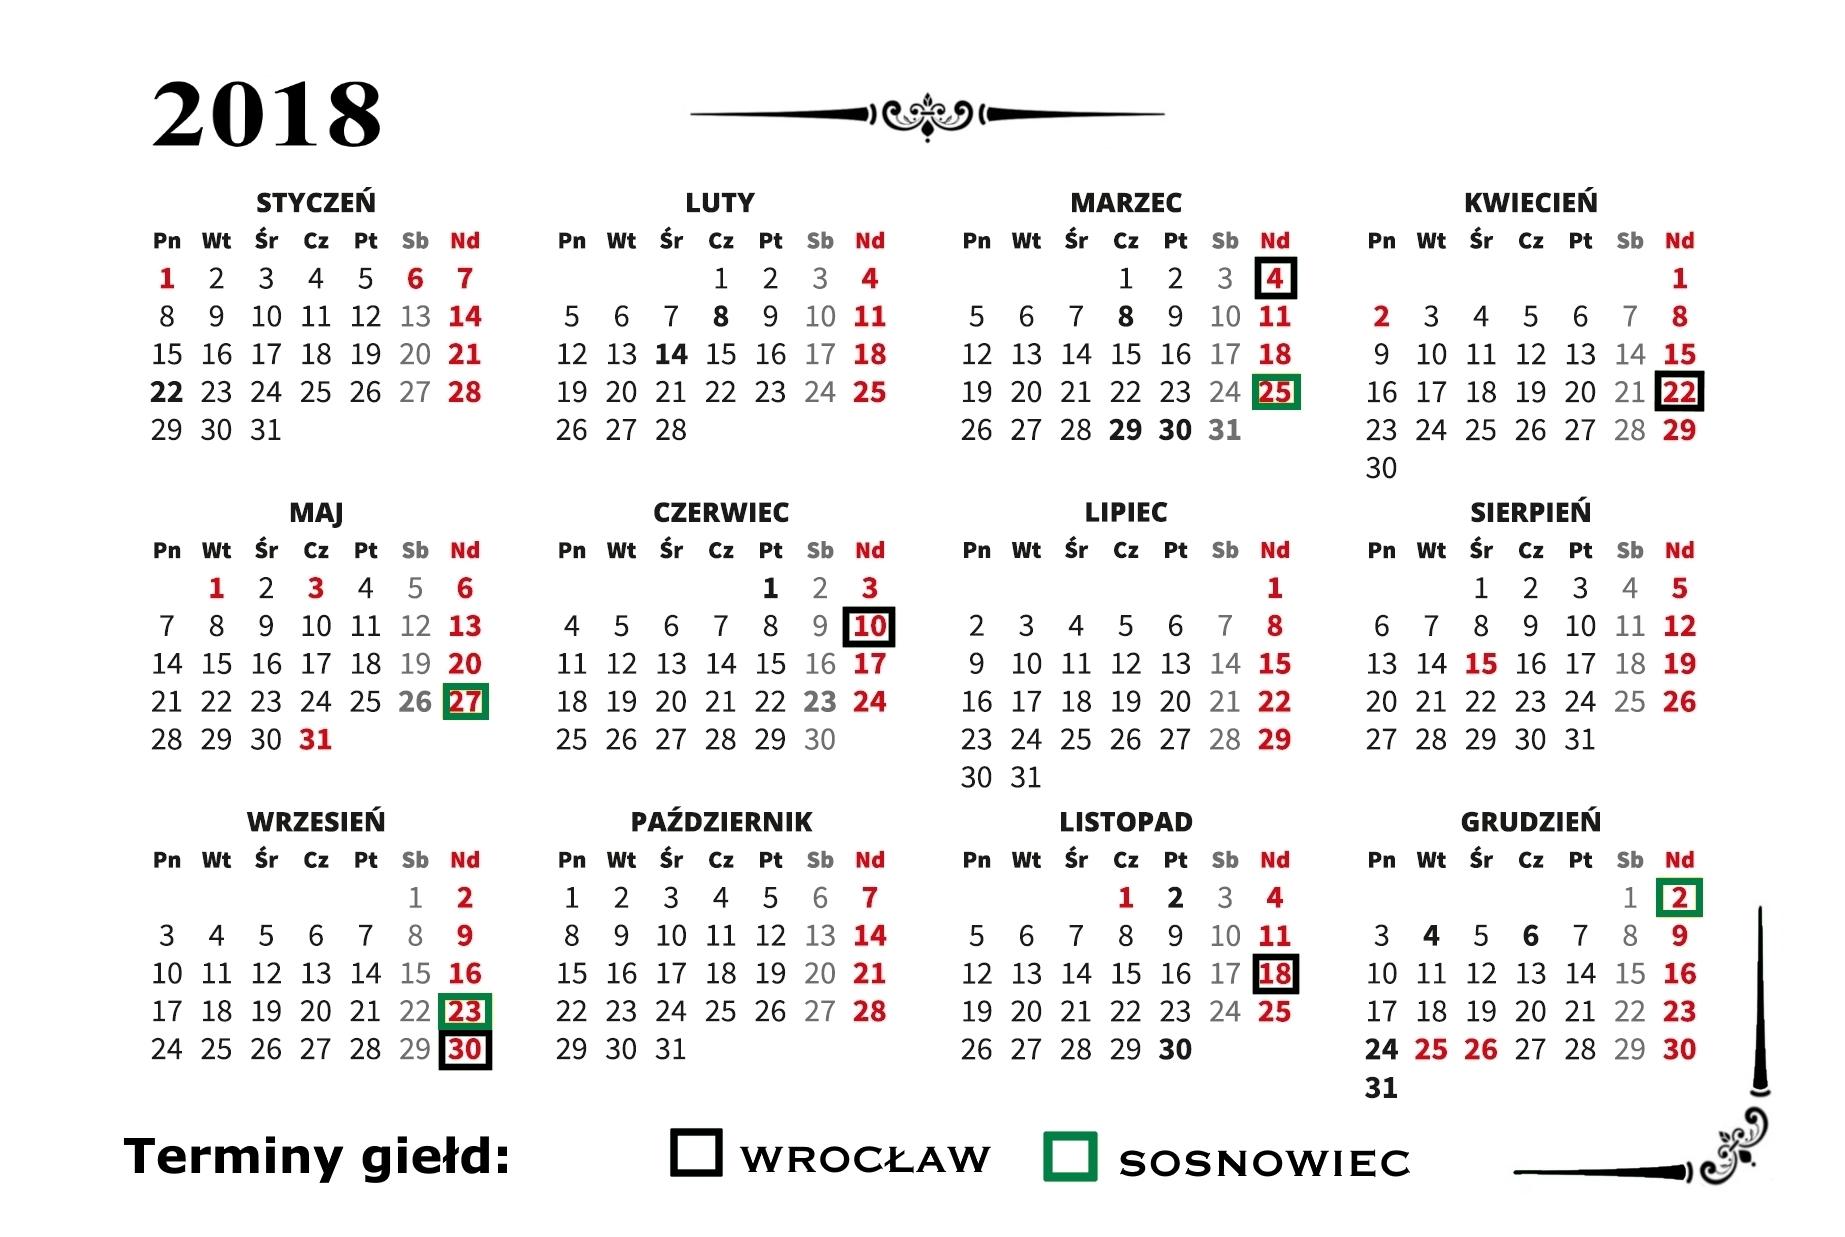 kalendarzyk_2018_terminy OldtimerbazaR'u 2018 rok